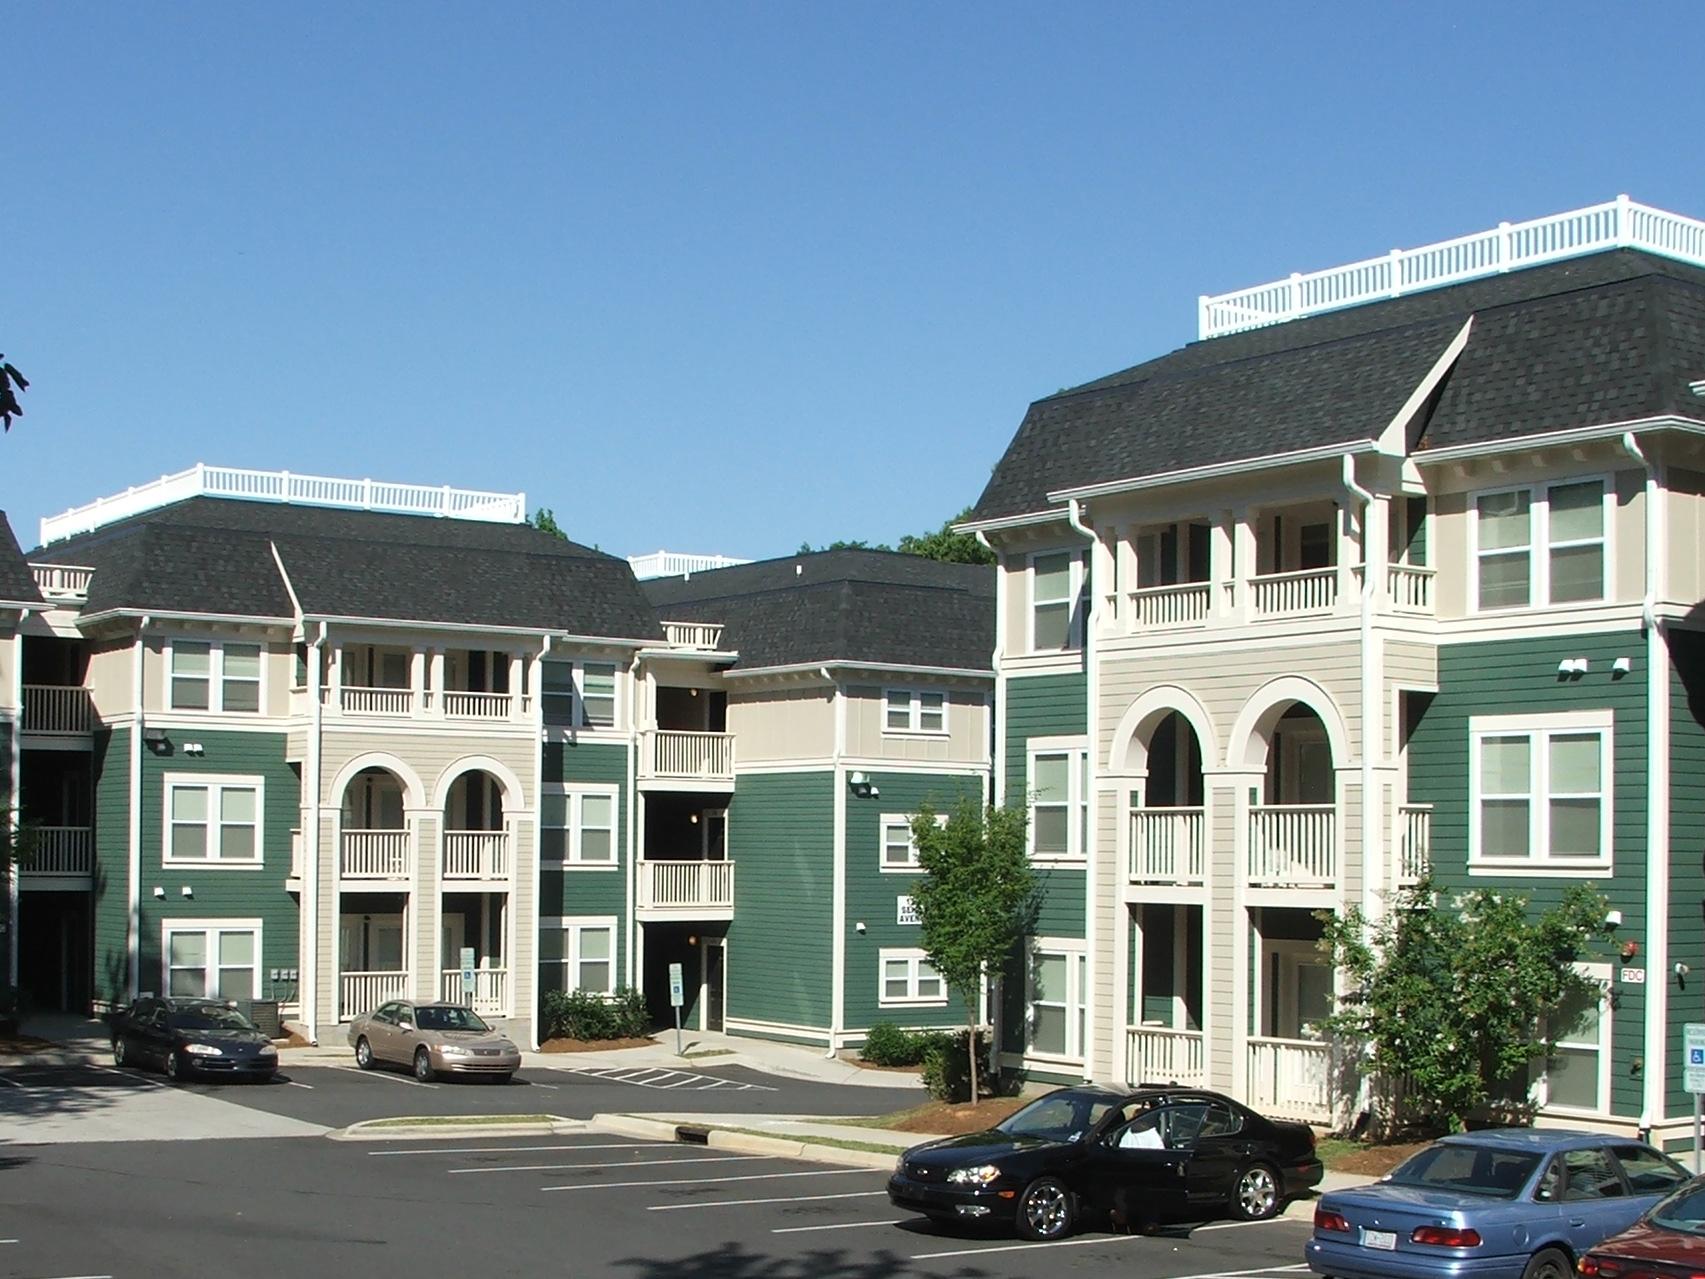 08.07.01CHA-McAden Apartments 011.jpg